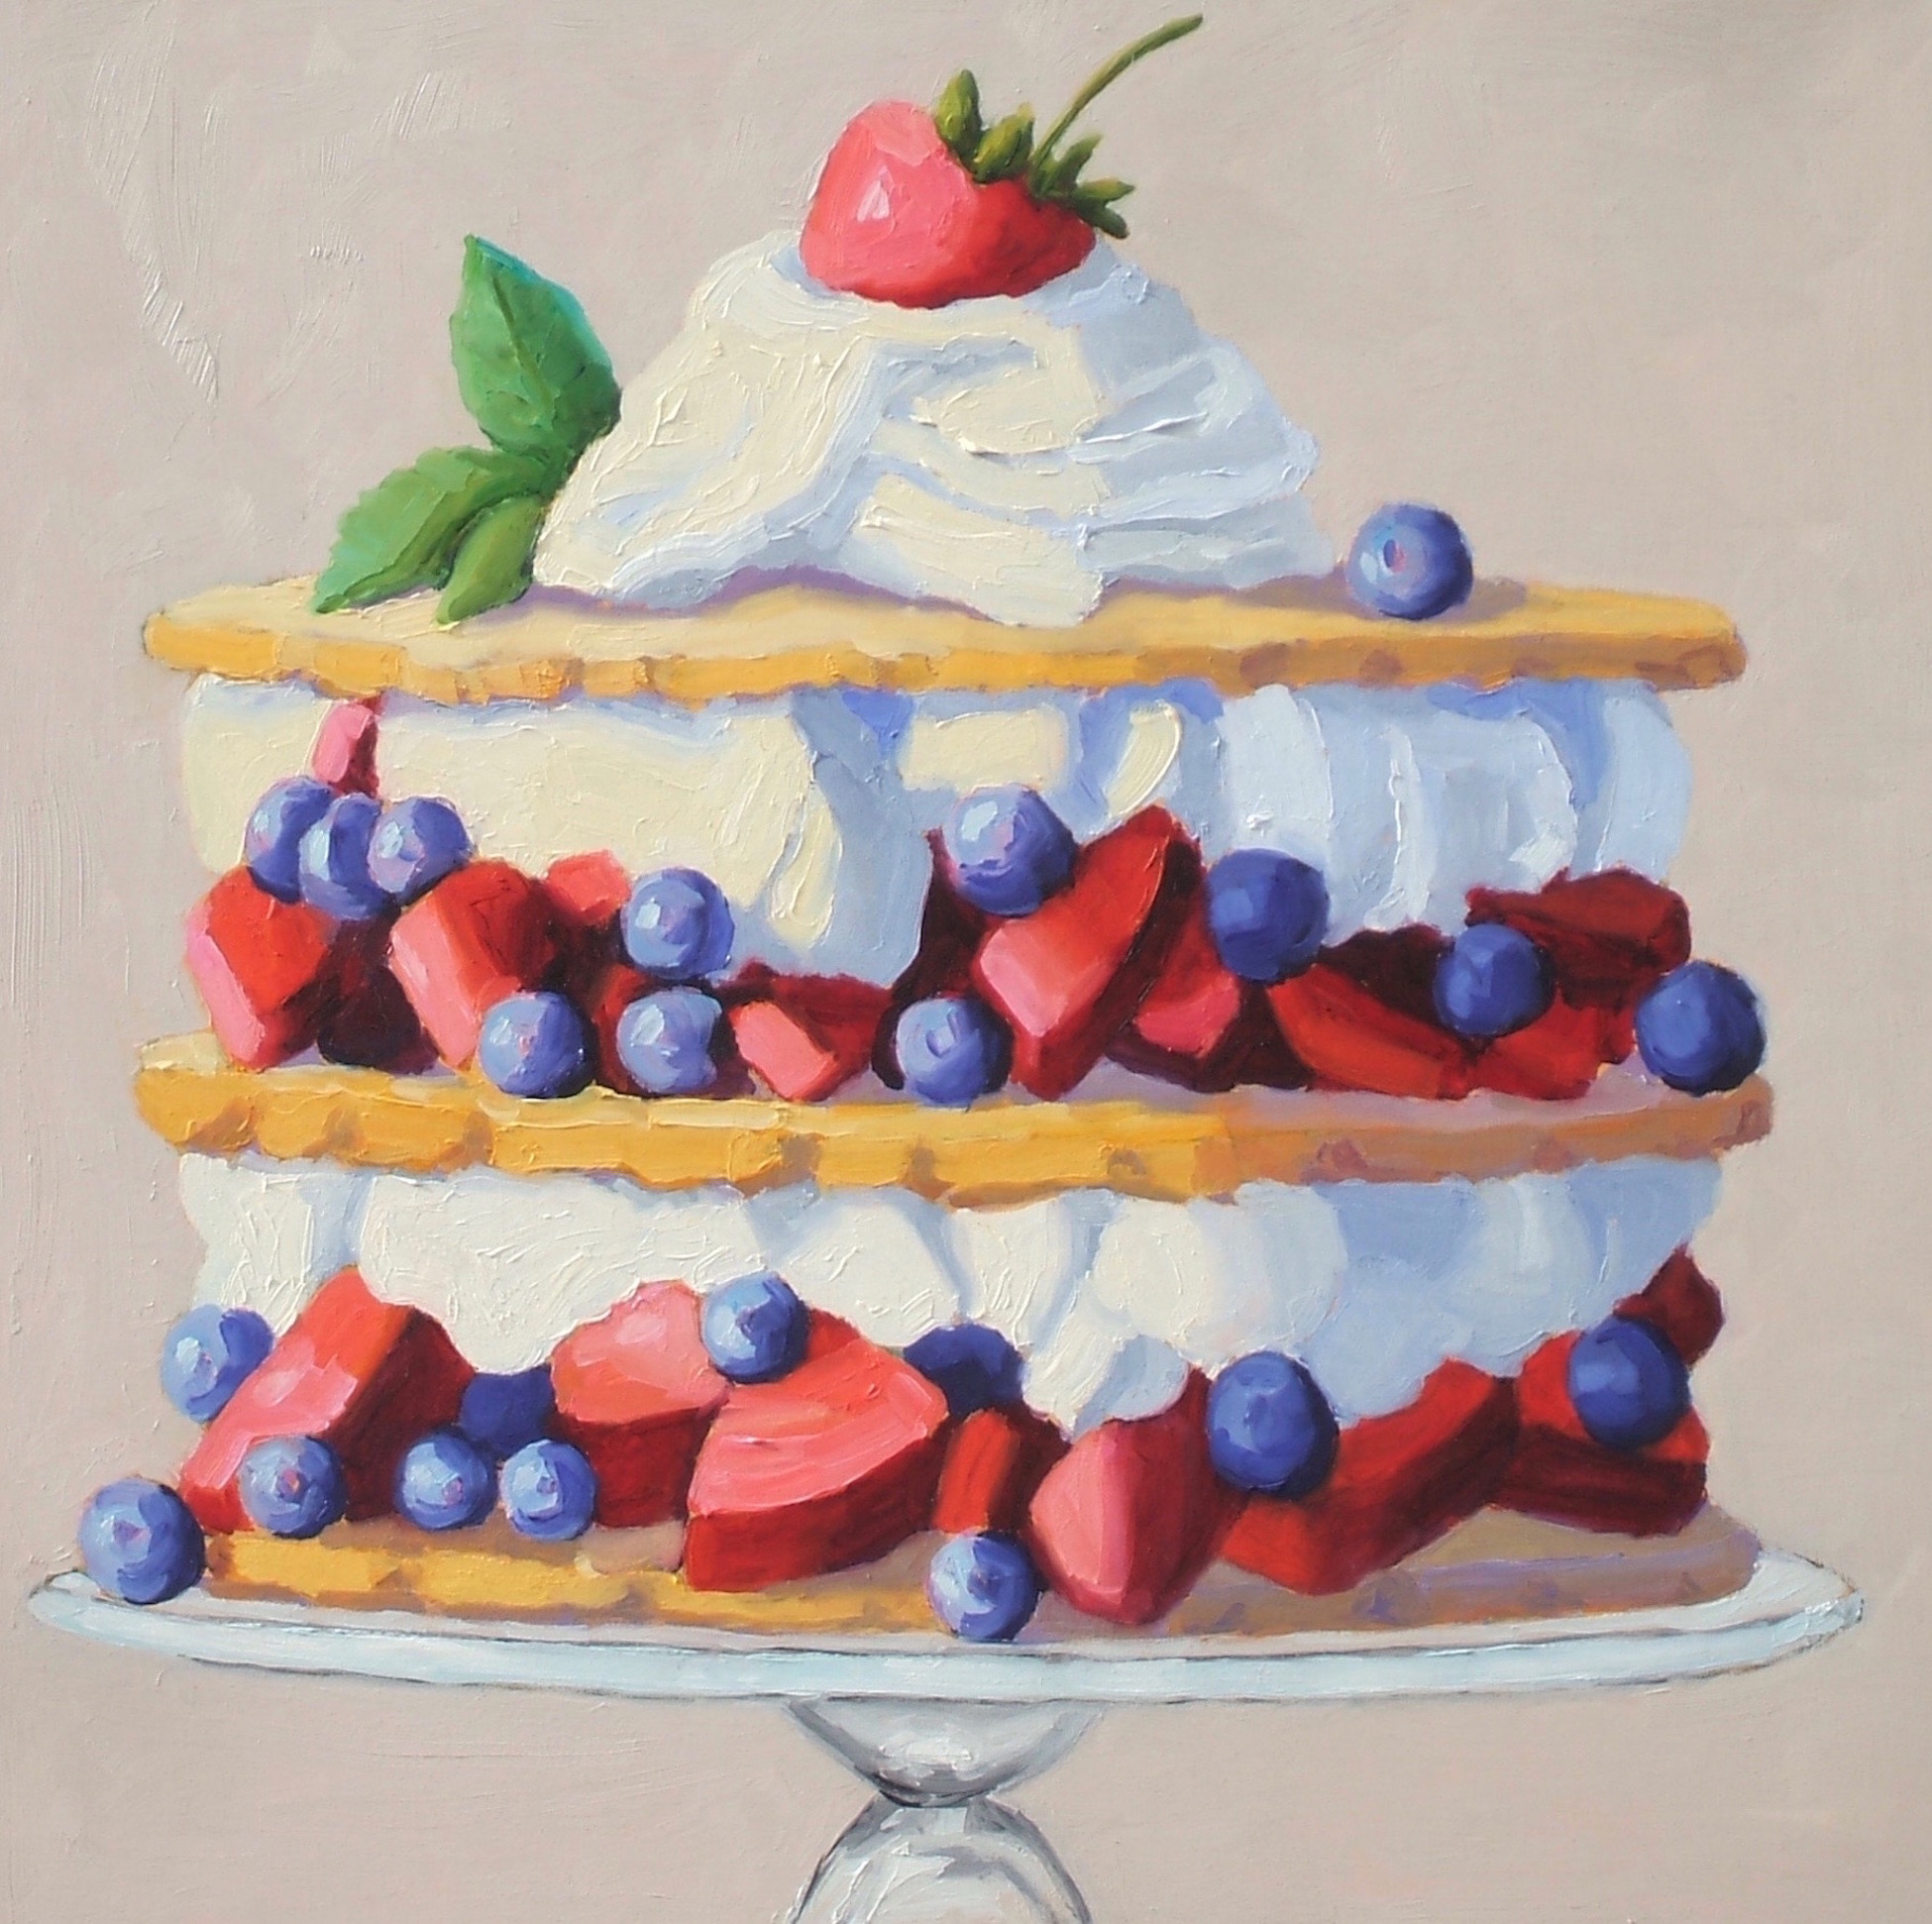 Berry Layer Torte